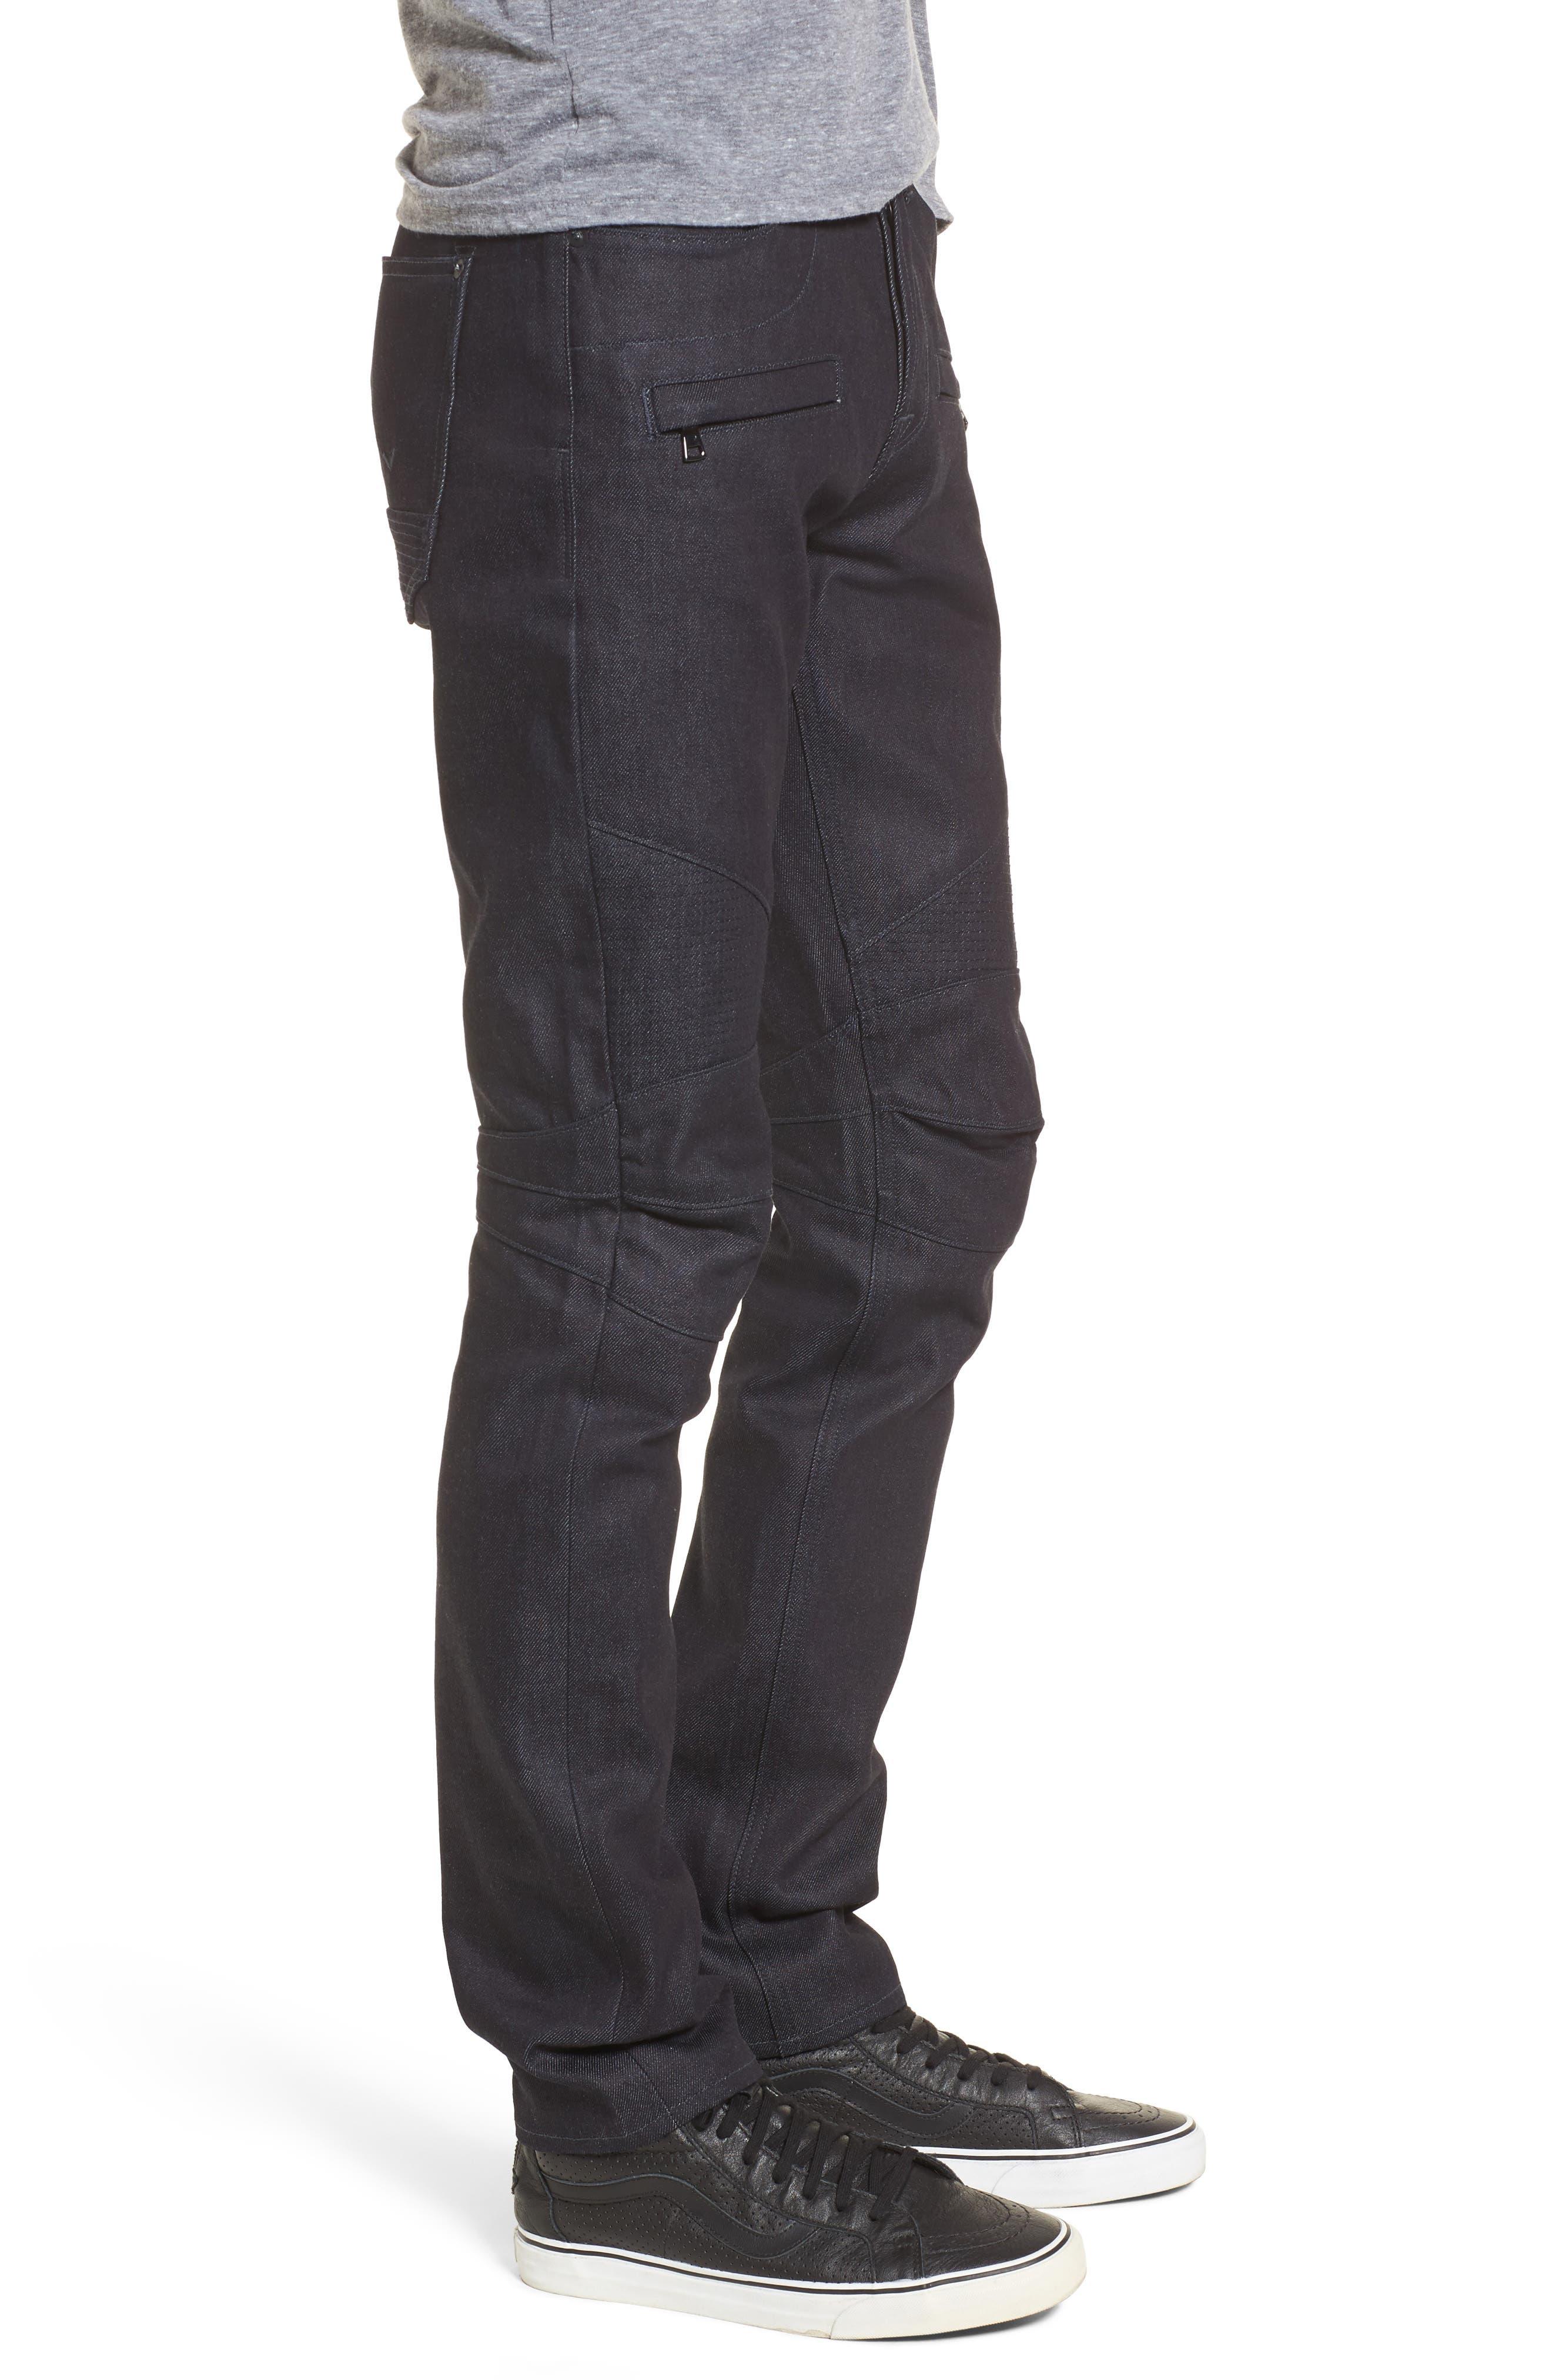 Blinder Biker Skinny Fit Jeans,                             Alternate thumbnail 3, color,                             Raw